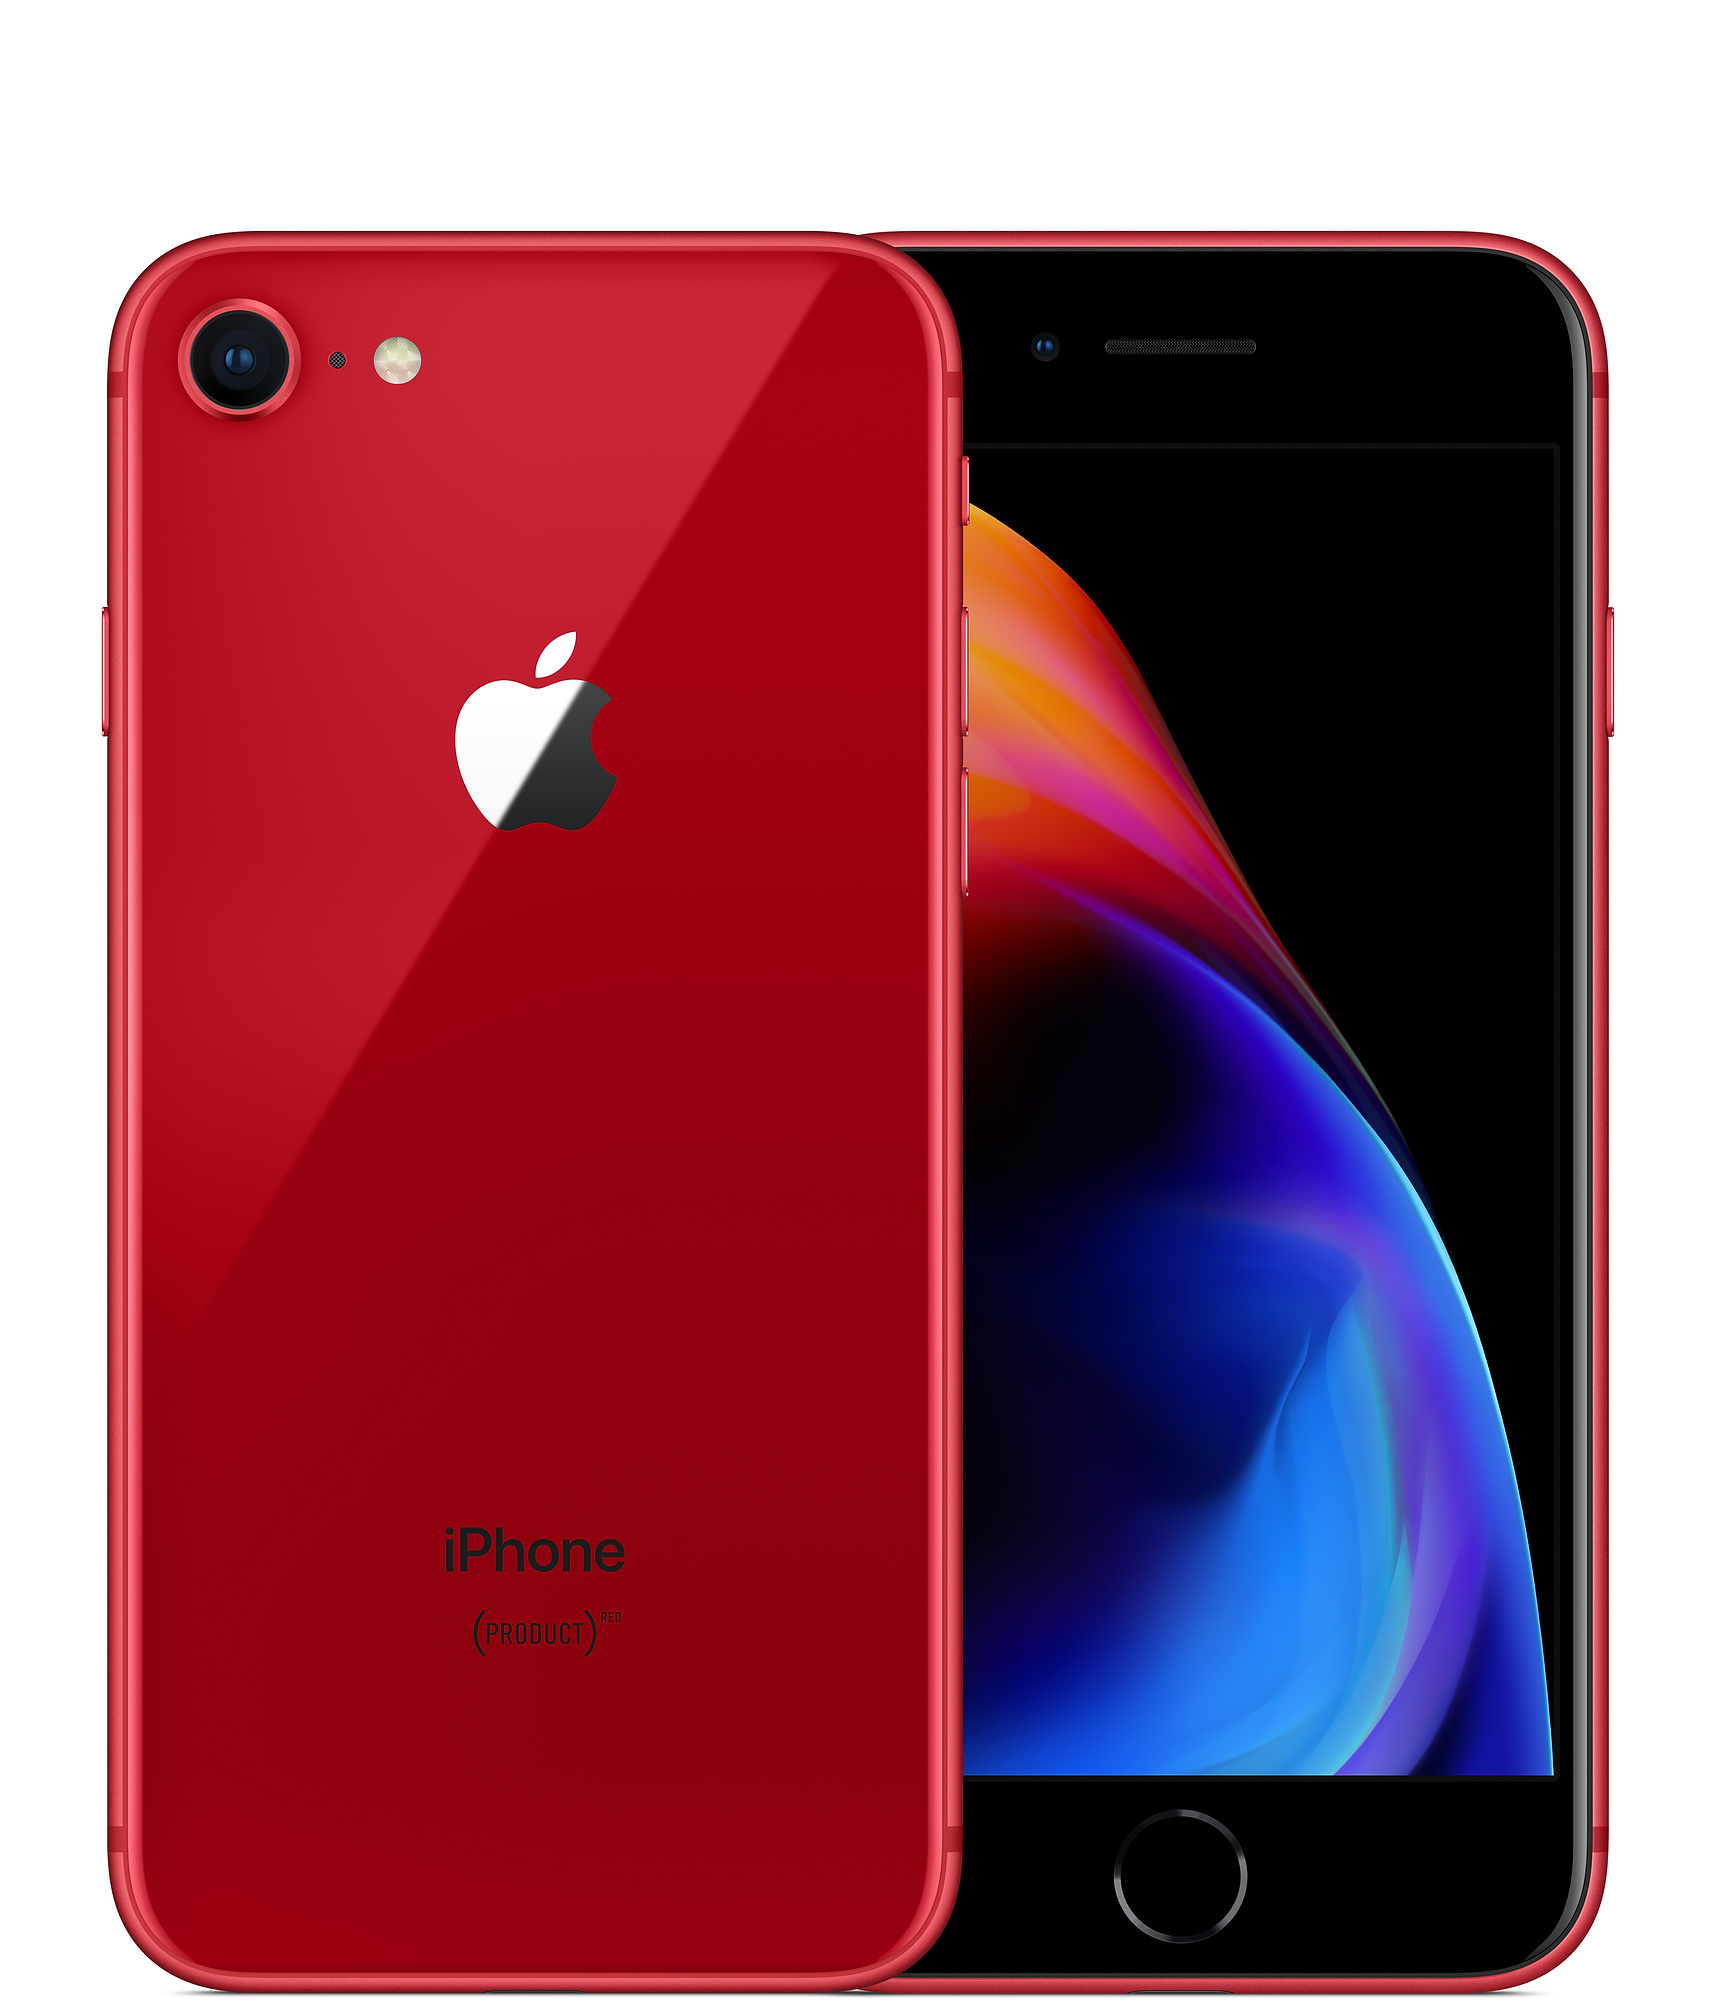 ces smartphones qui se d clinent en rouge oneplus 6 red iphone 8 red xiaomi mi a1 honor. Black Bedroom Furniture Sets. Home Design Ideas